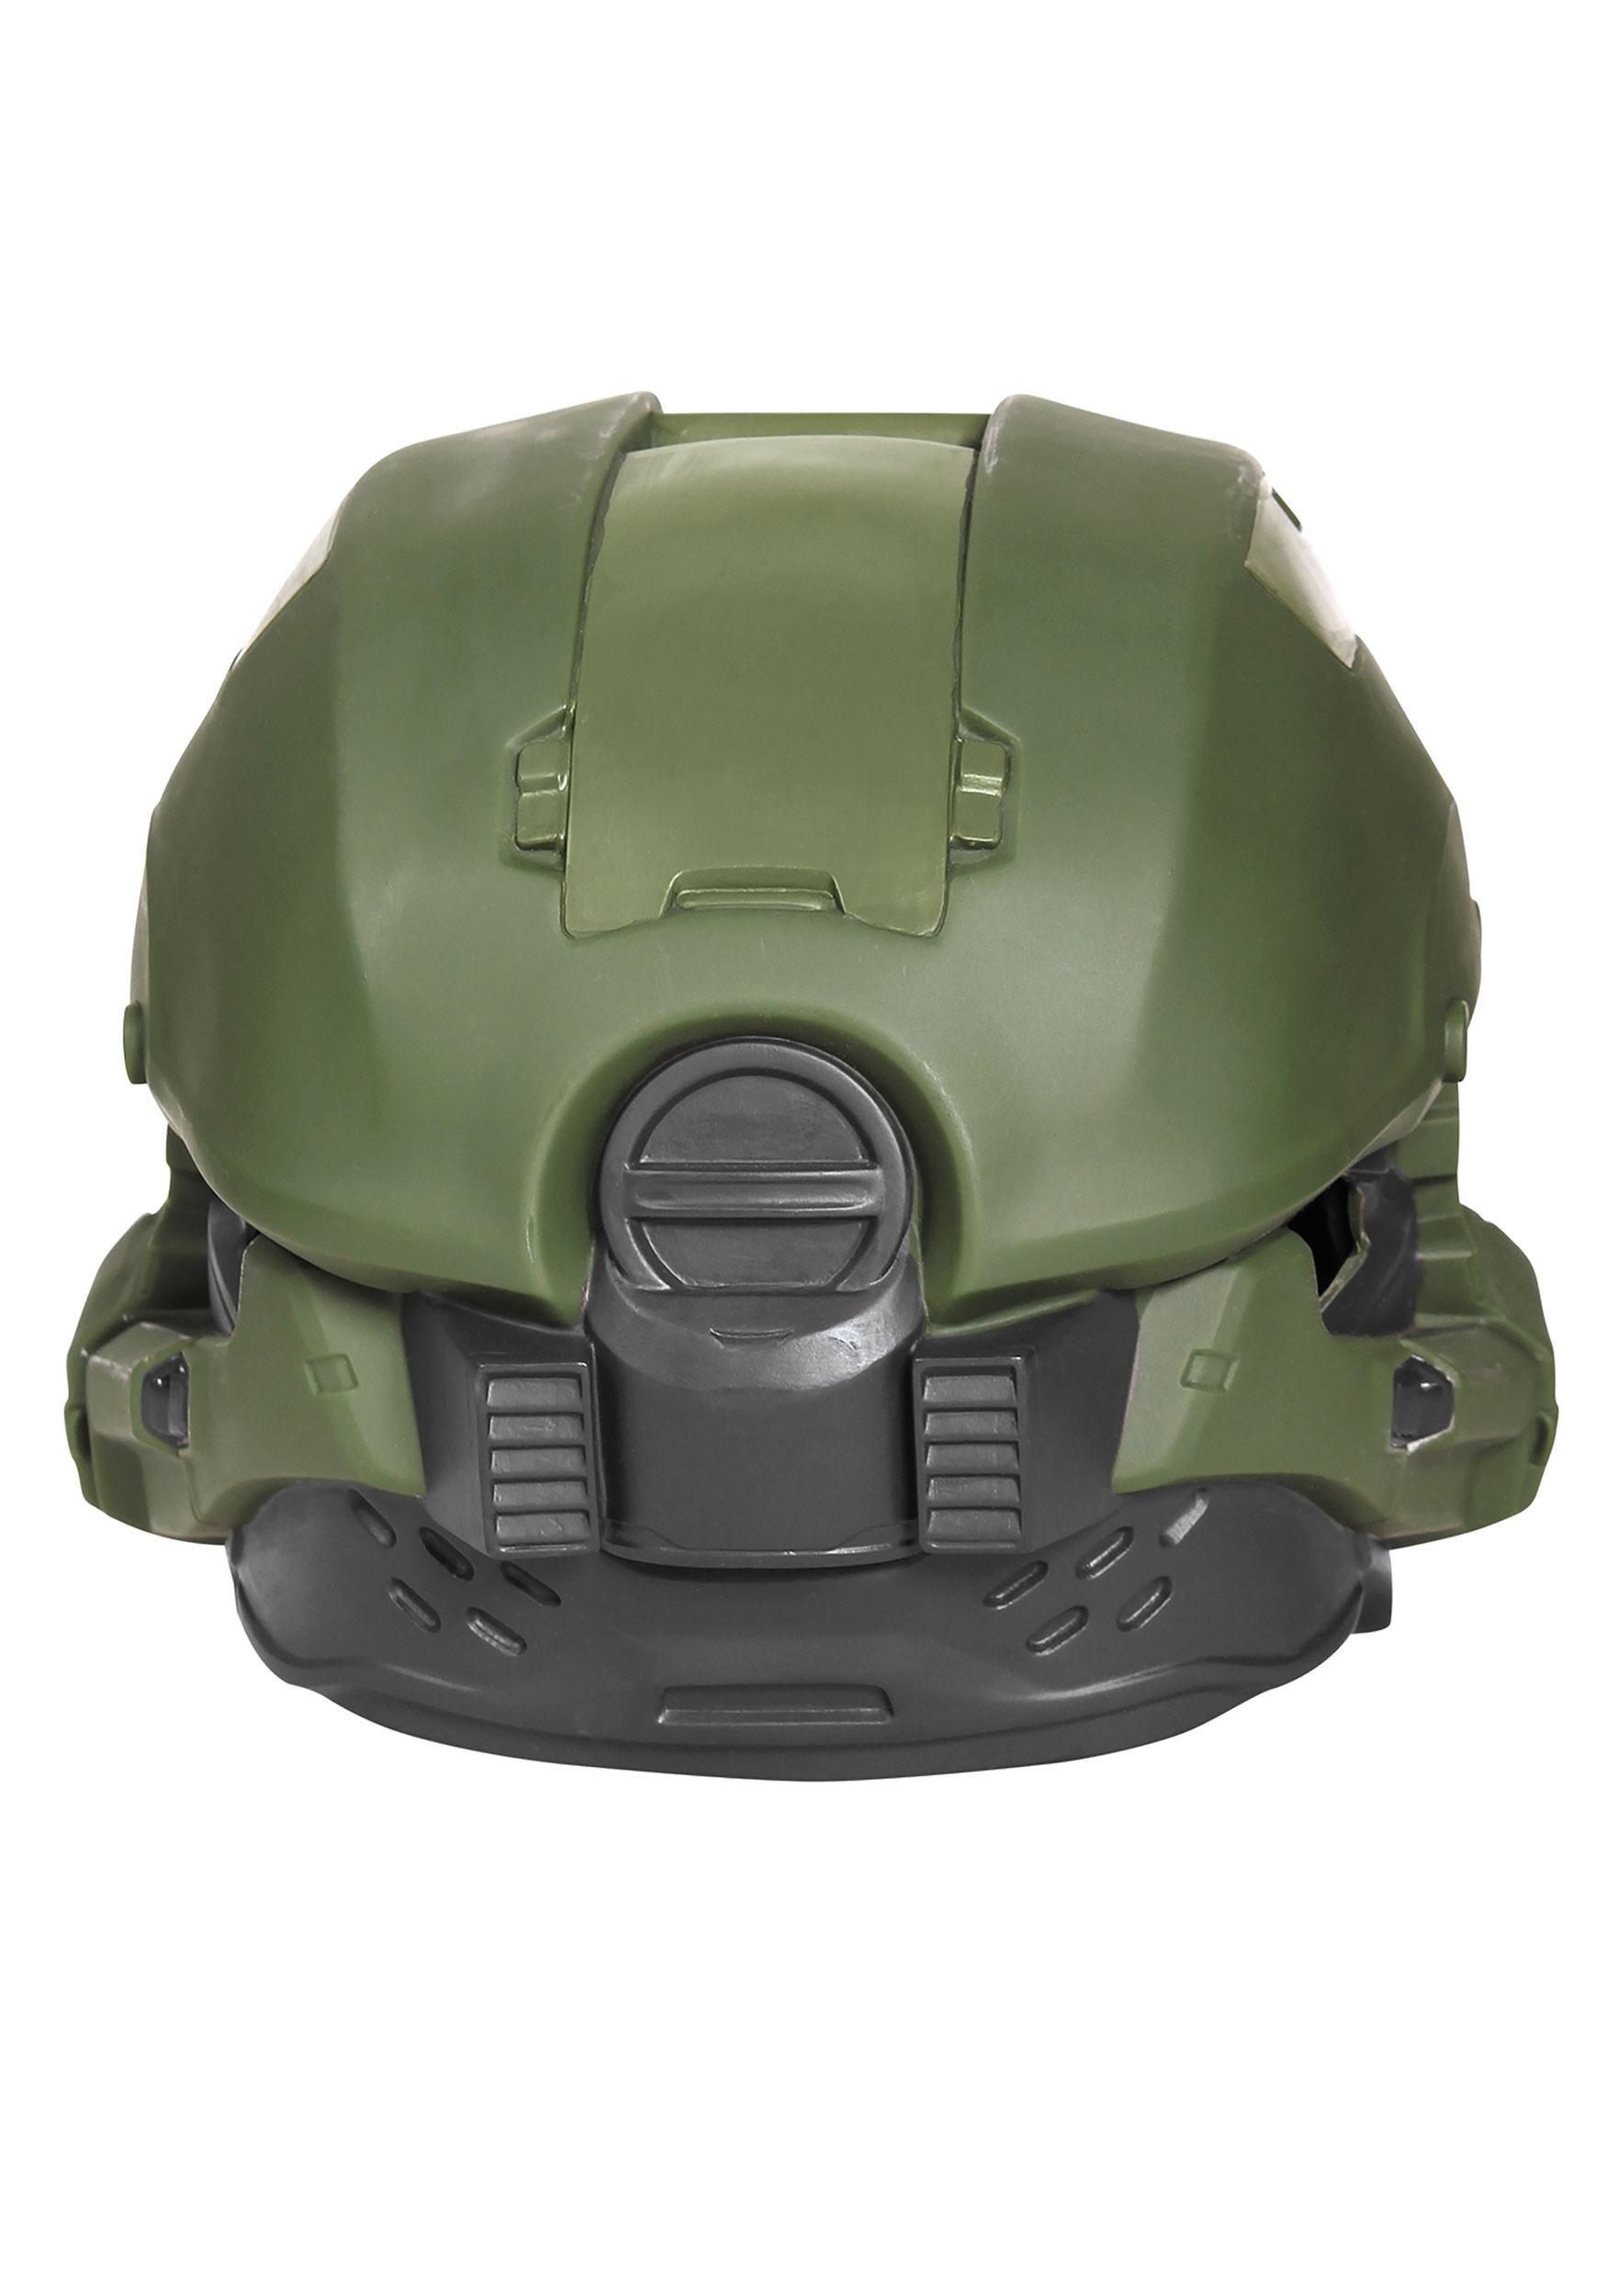 master chief light up helmet for kids